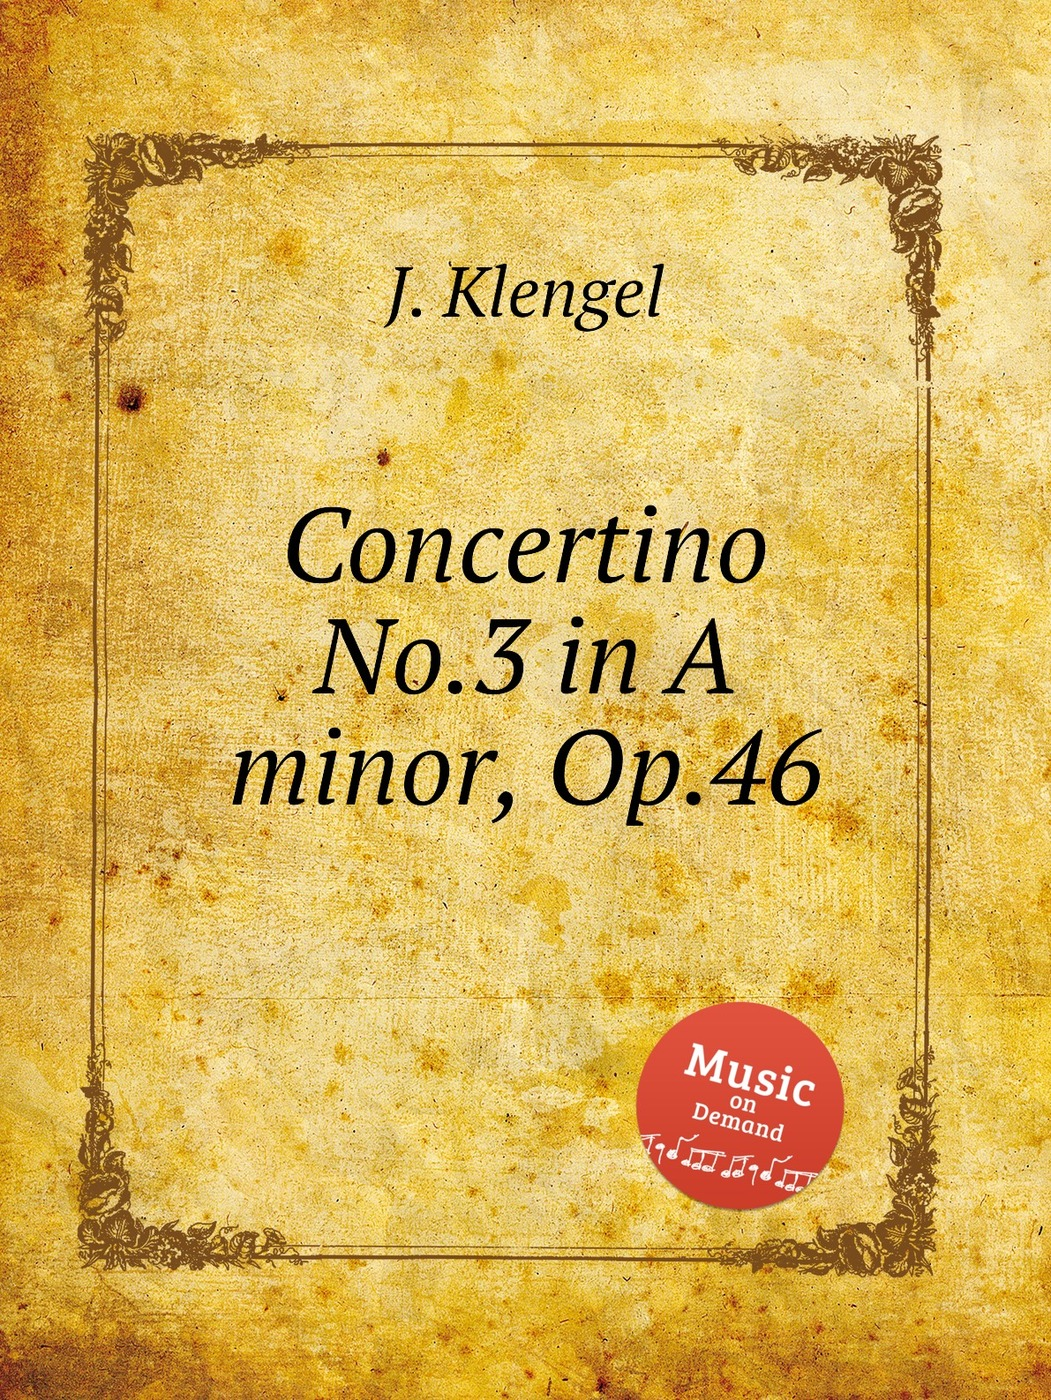 Concertino No.3 in A minor, Op.46